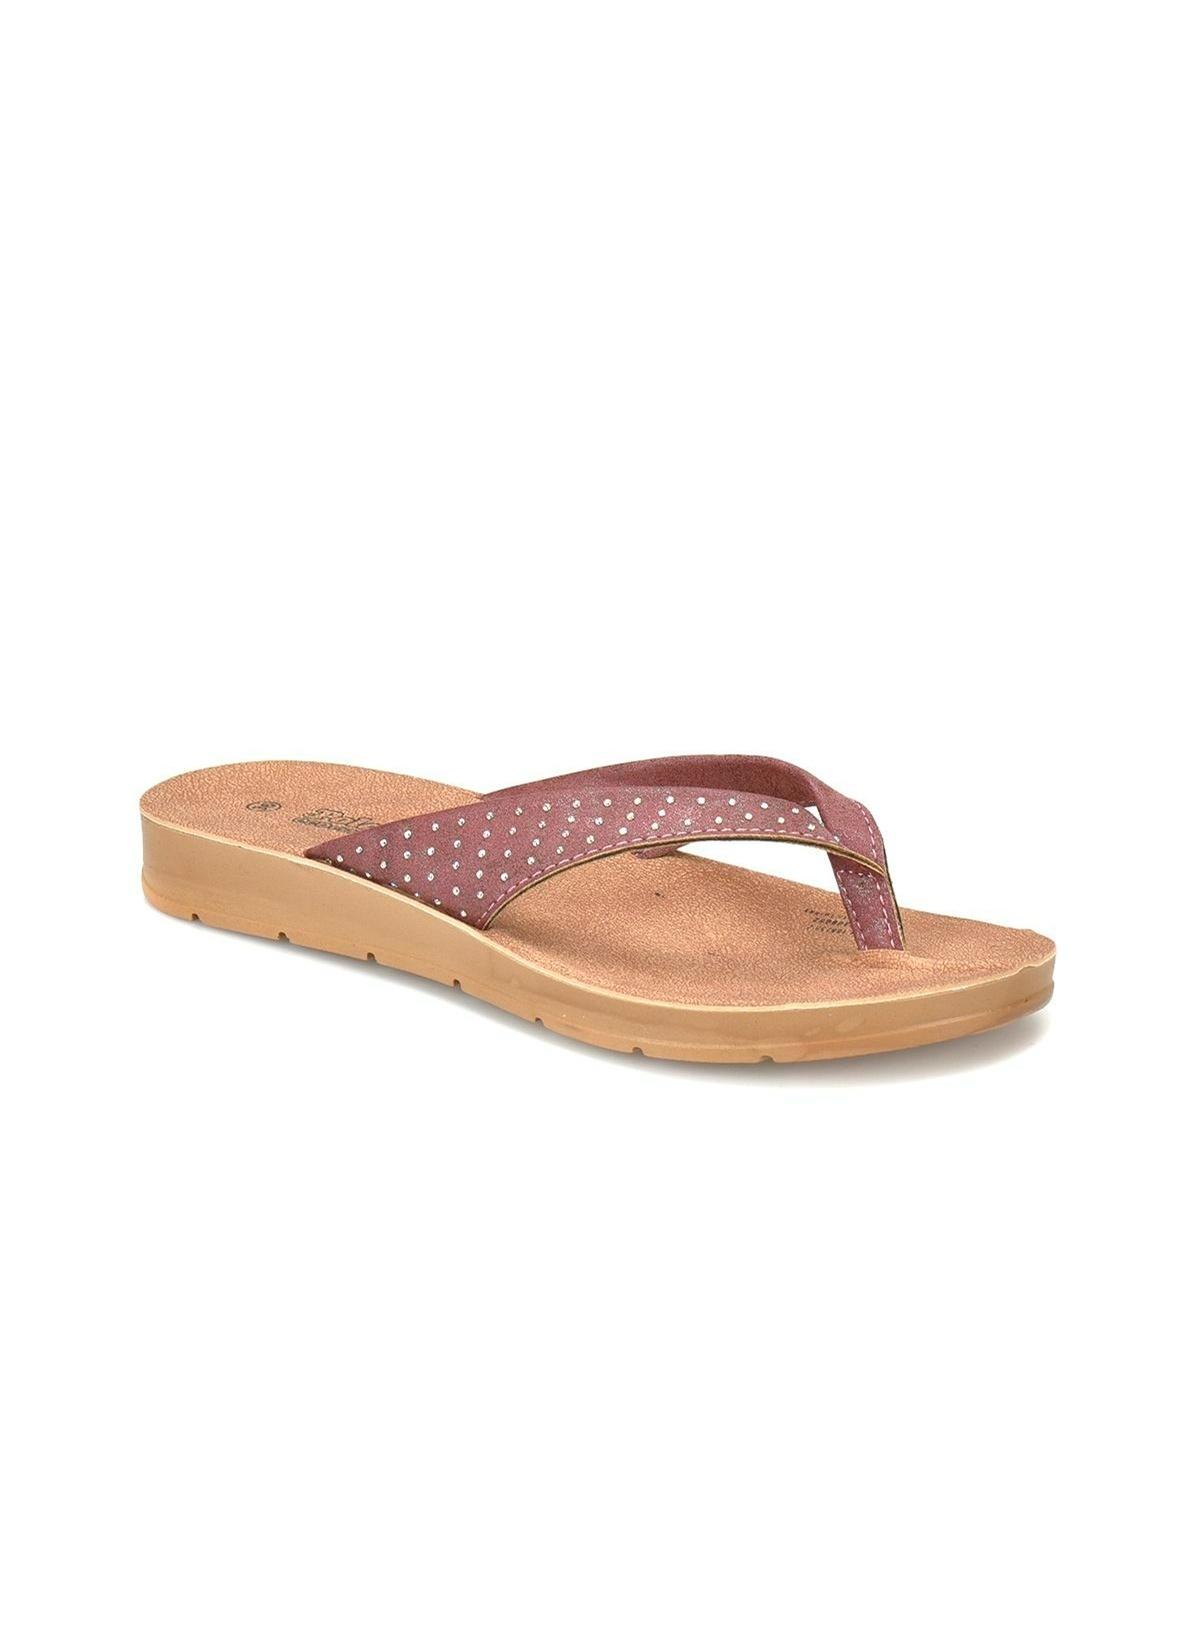 Polaris Sandalet 81.158739.z Basic Comfort – 42.59 TL